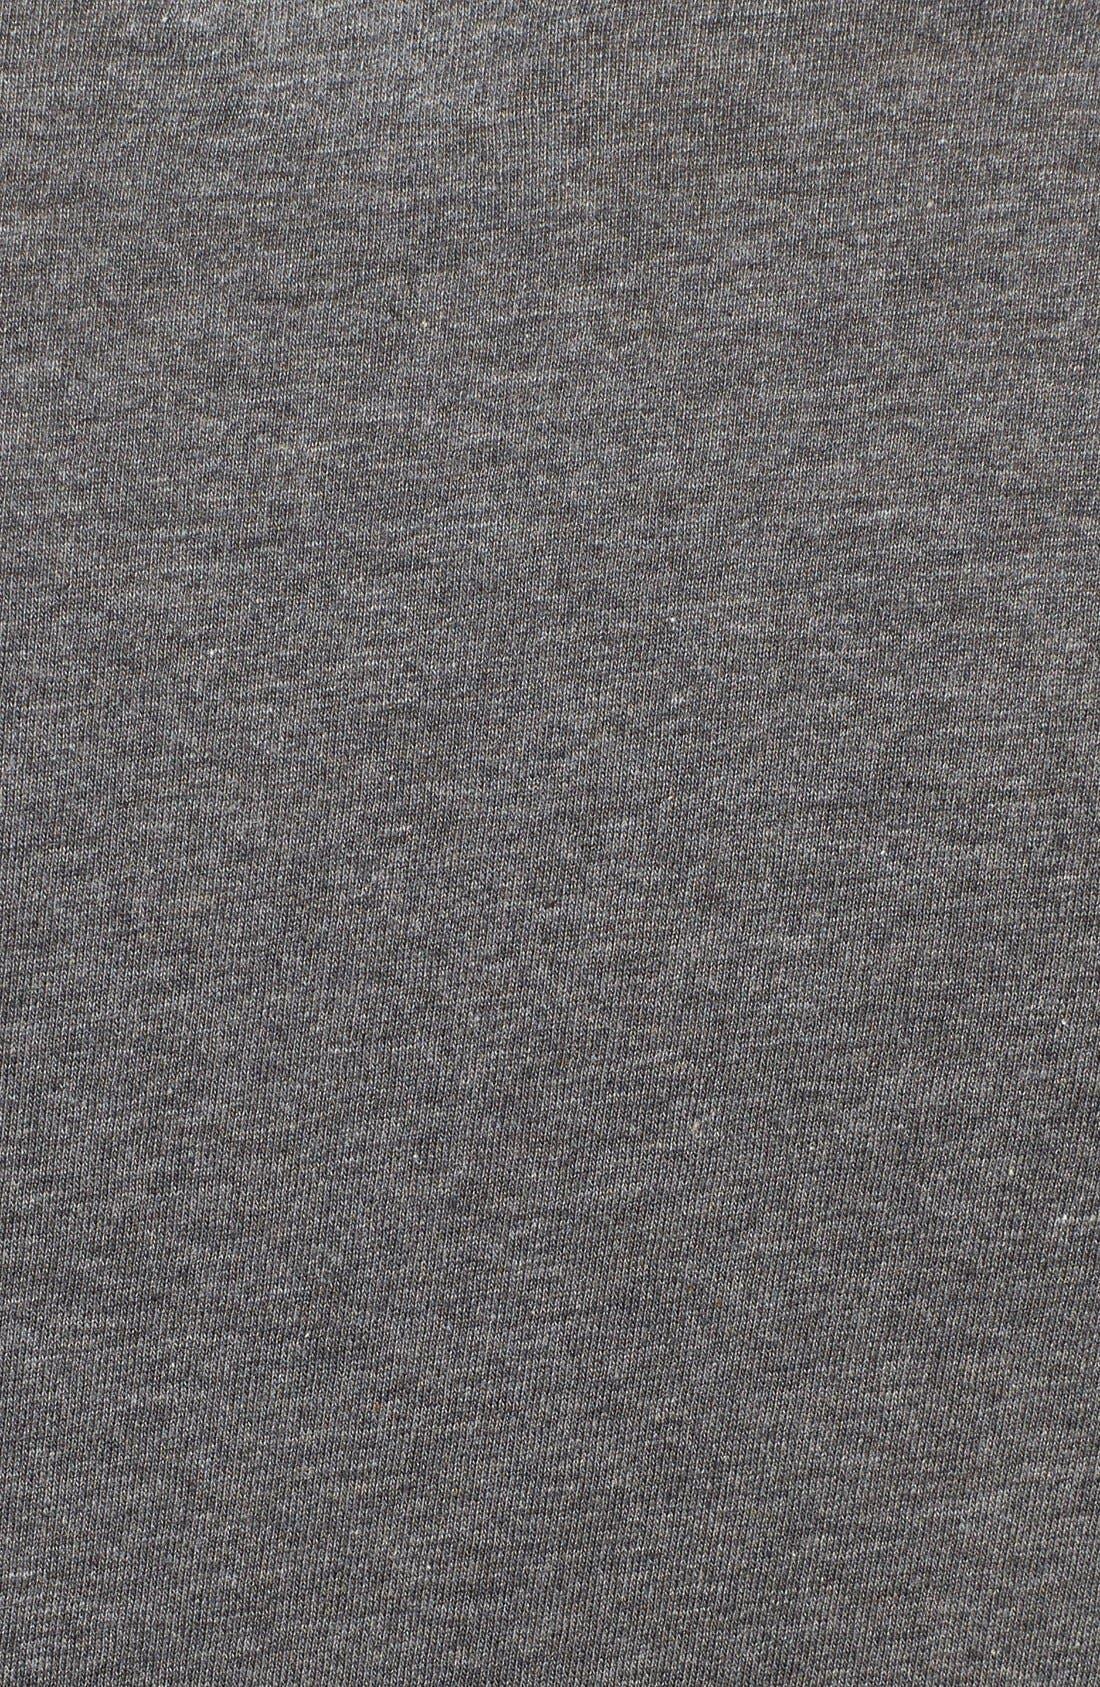 3-Pack Slim Fit T-Shirt,                             Alternate thumbnail 5, color,                             BLACK/ GREY/ CHARCOAL